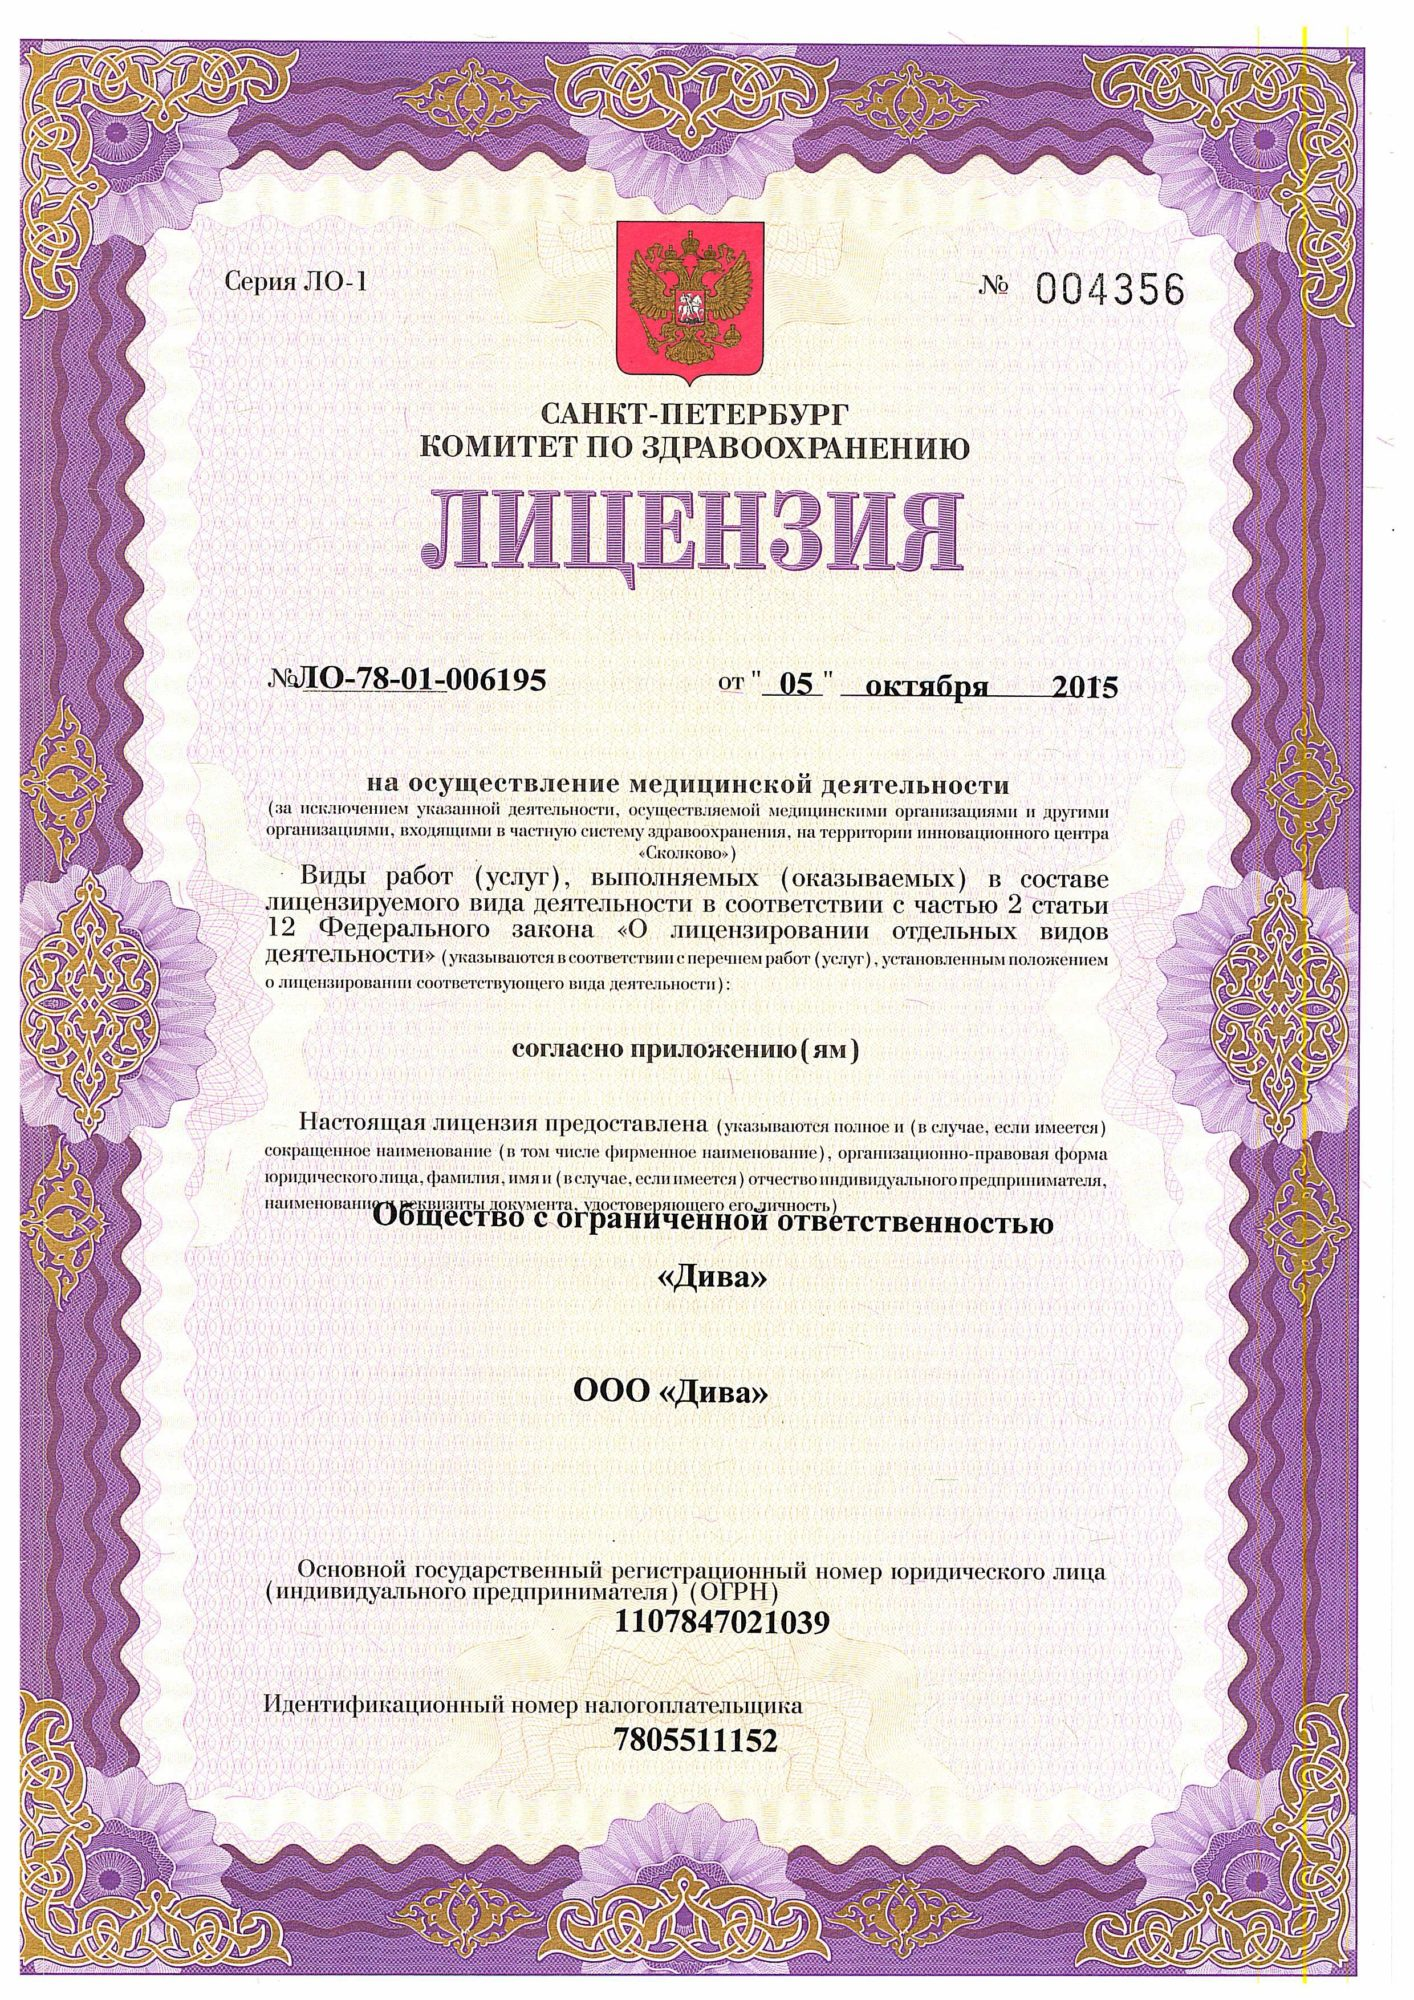 licenziya-1-new